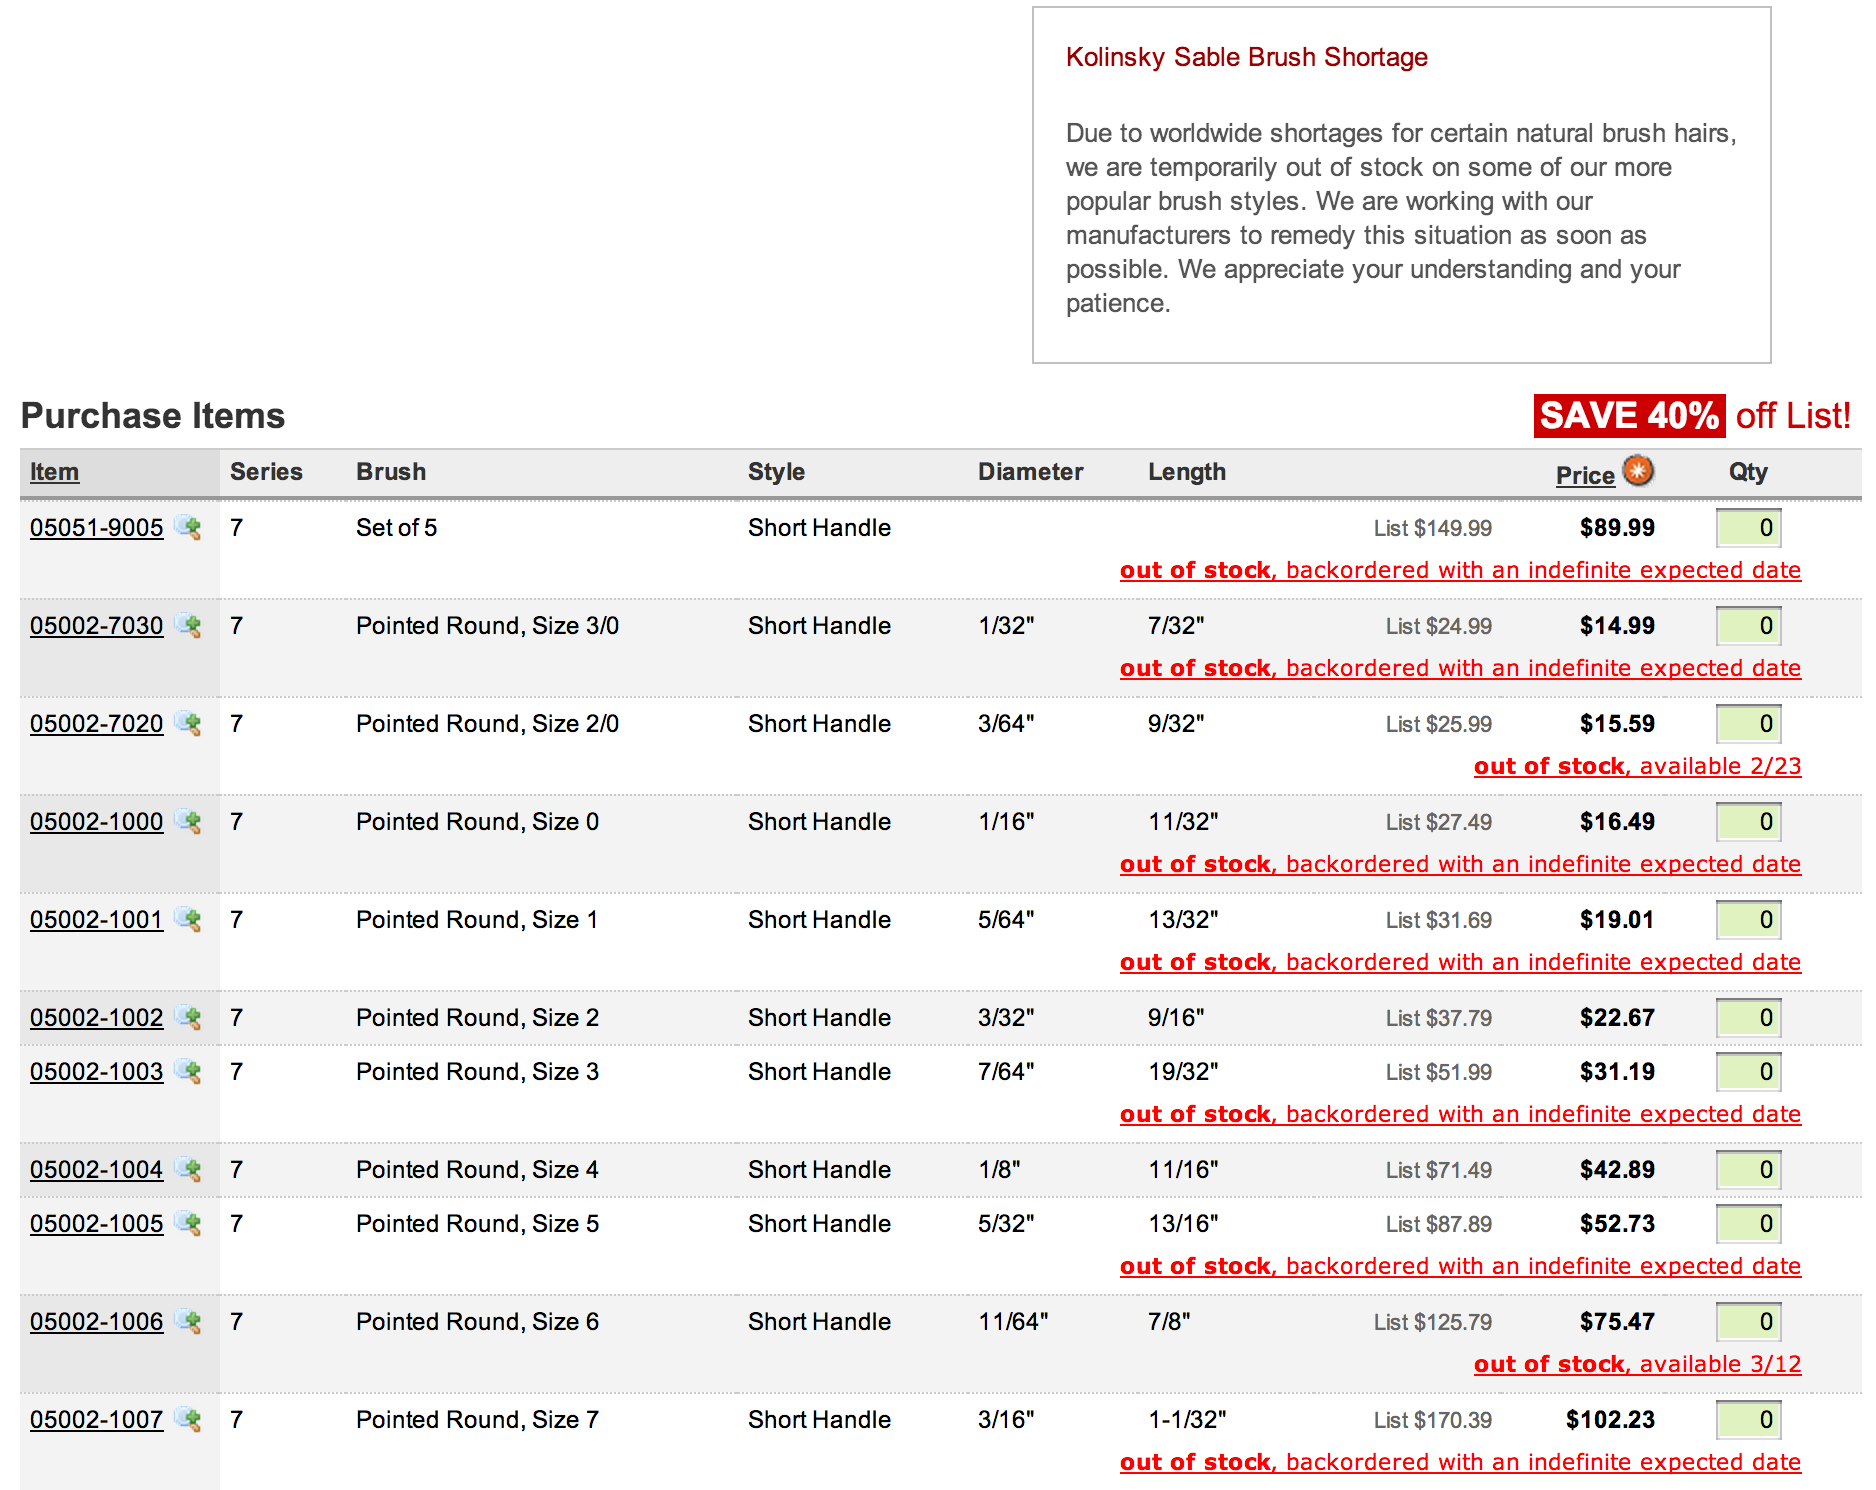 Screenshot 2014-01-24 18.51.31.png